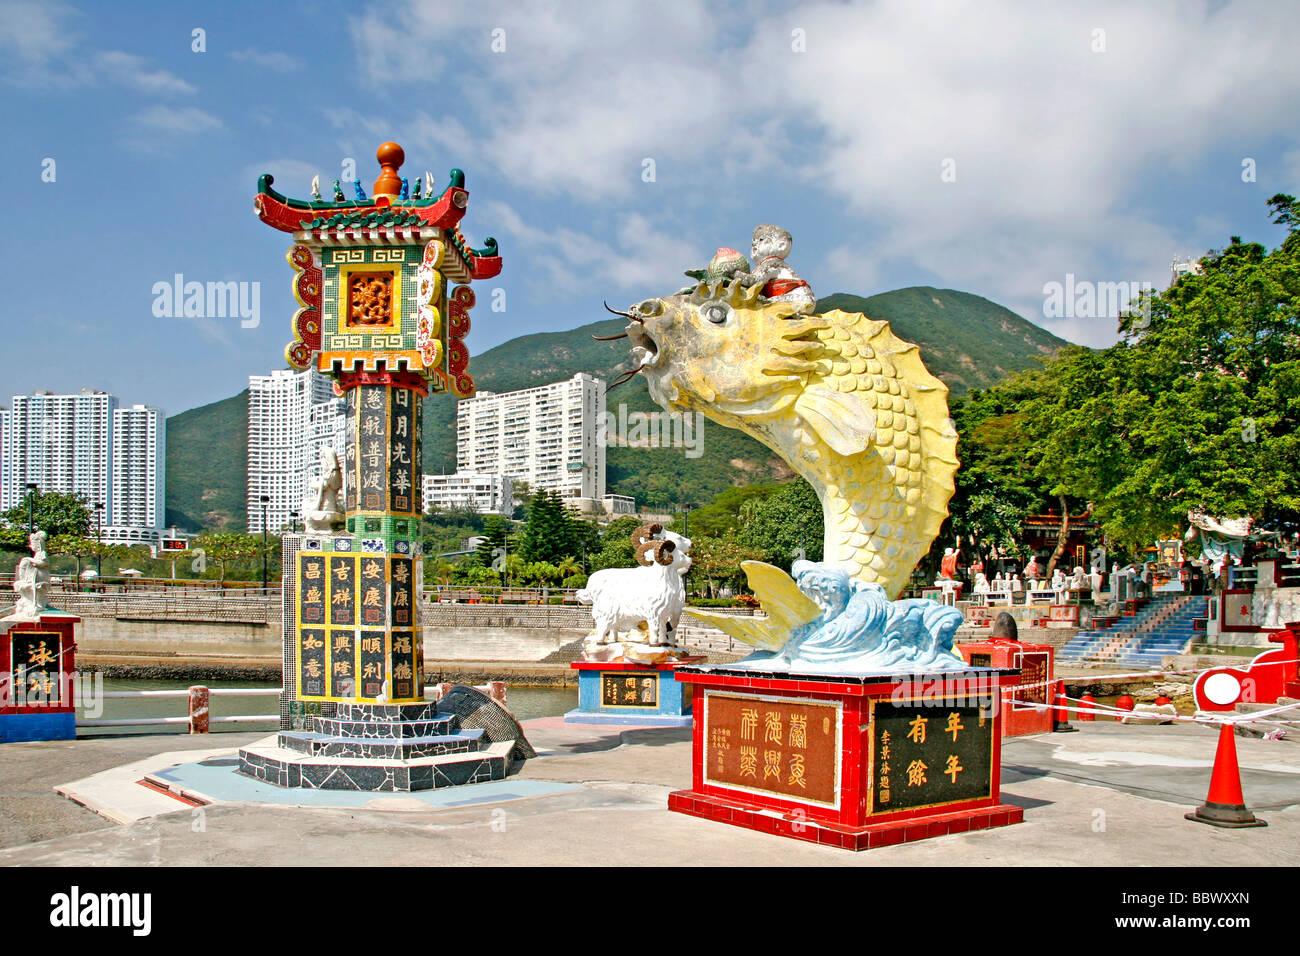 Statues with symbolic Chinese imagery, Park, Repulse Bay, seaside resort, Hong Kong, China, Asia - Stock Image